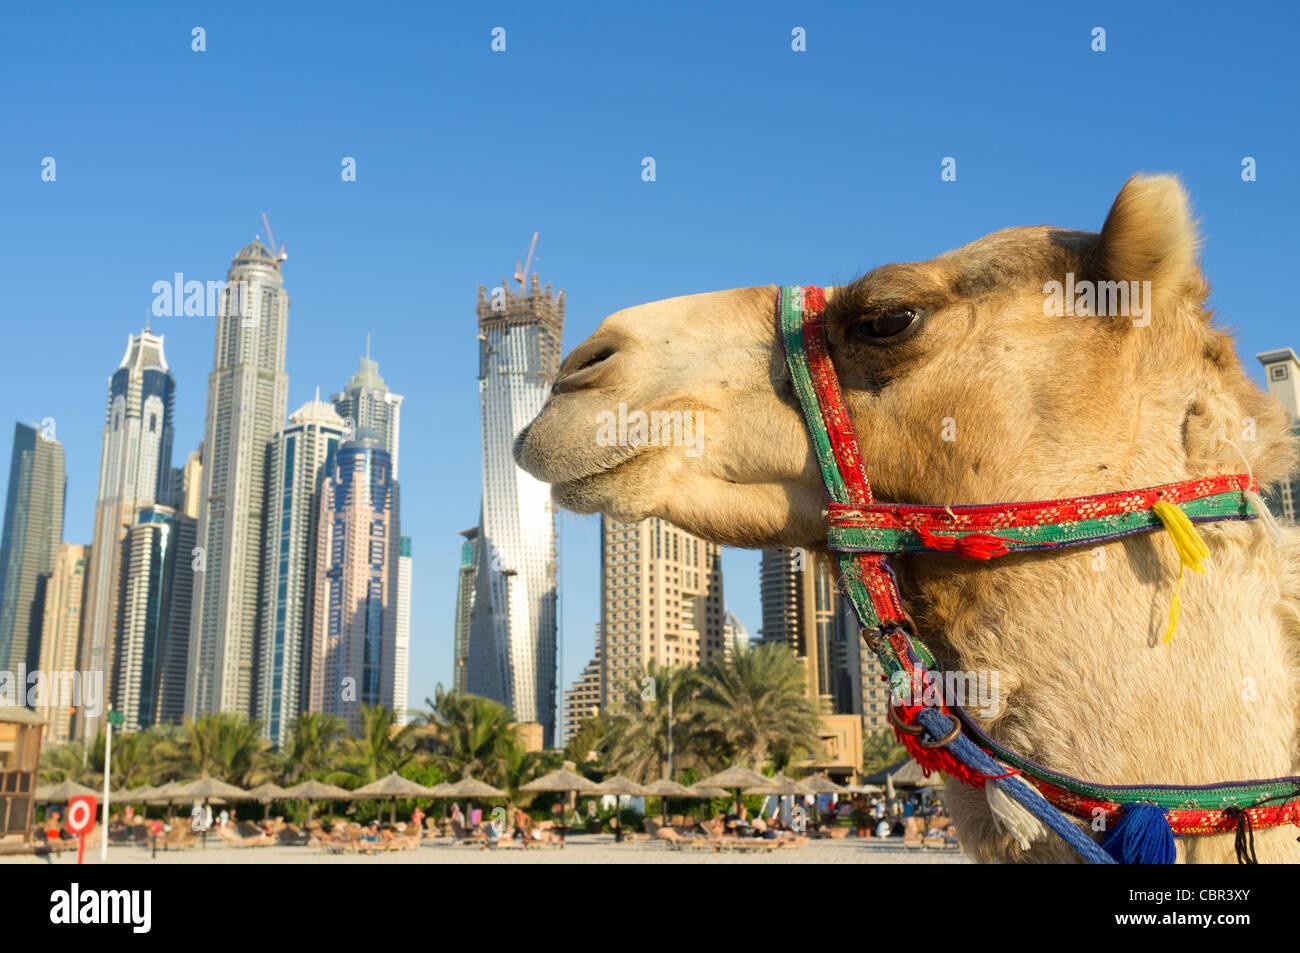 Camel dubai stock photos camel dubai stock images alamy camel on beach at jumeirah with new high rise buildings in new dubai in united altavistaventures Choice Image